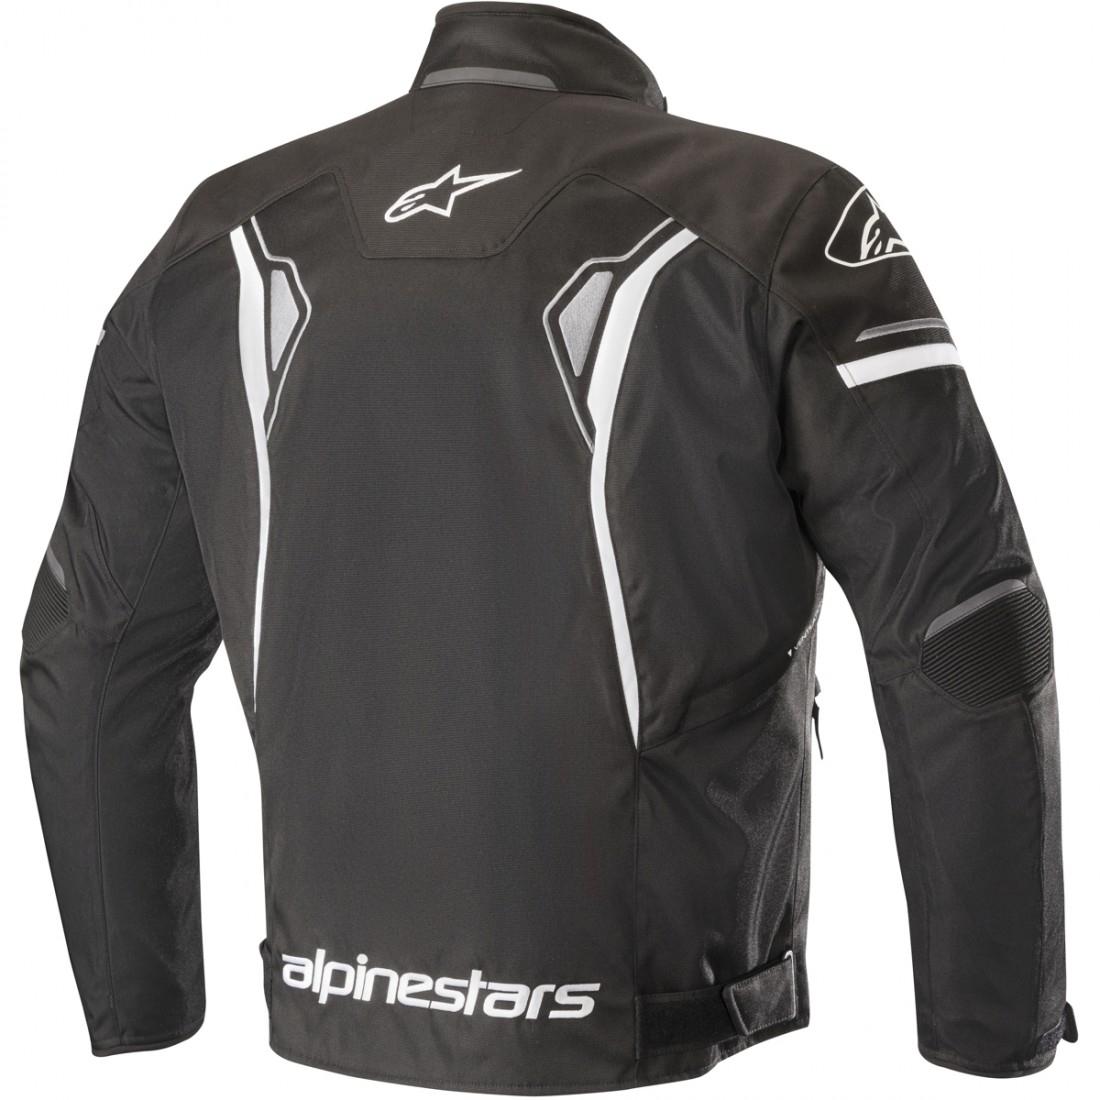 ALPINESTARS T-SP-1 Waterproof Black / White Jacket